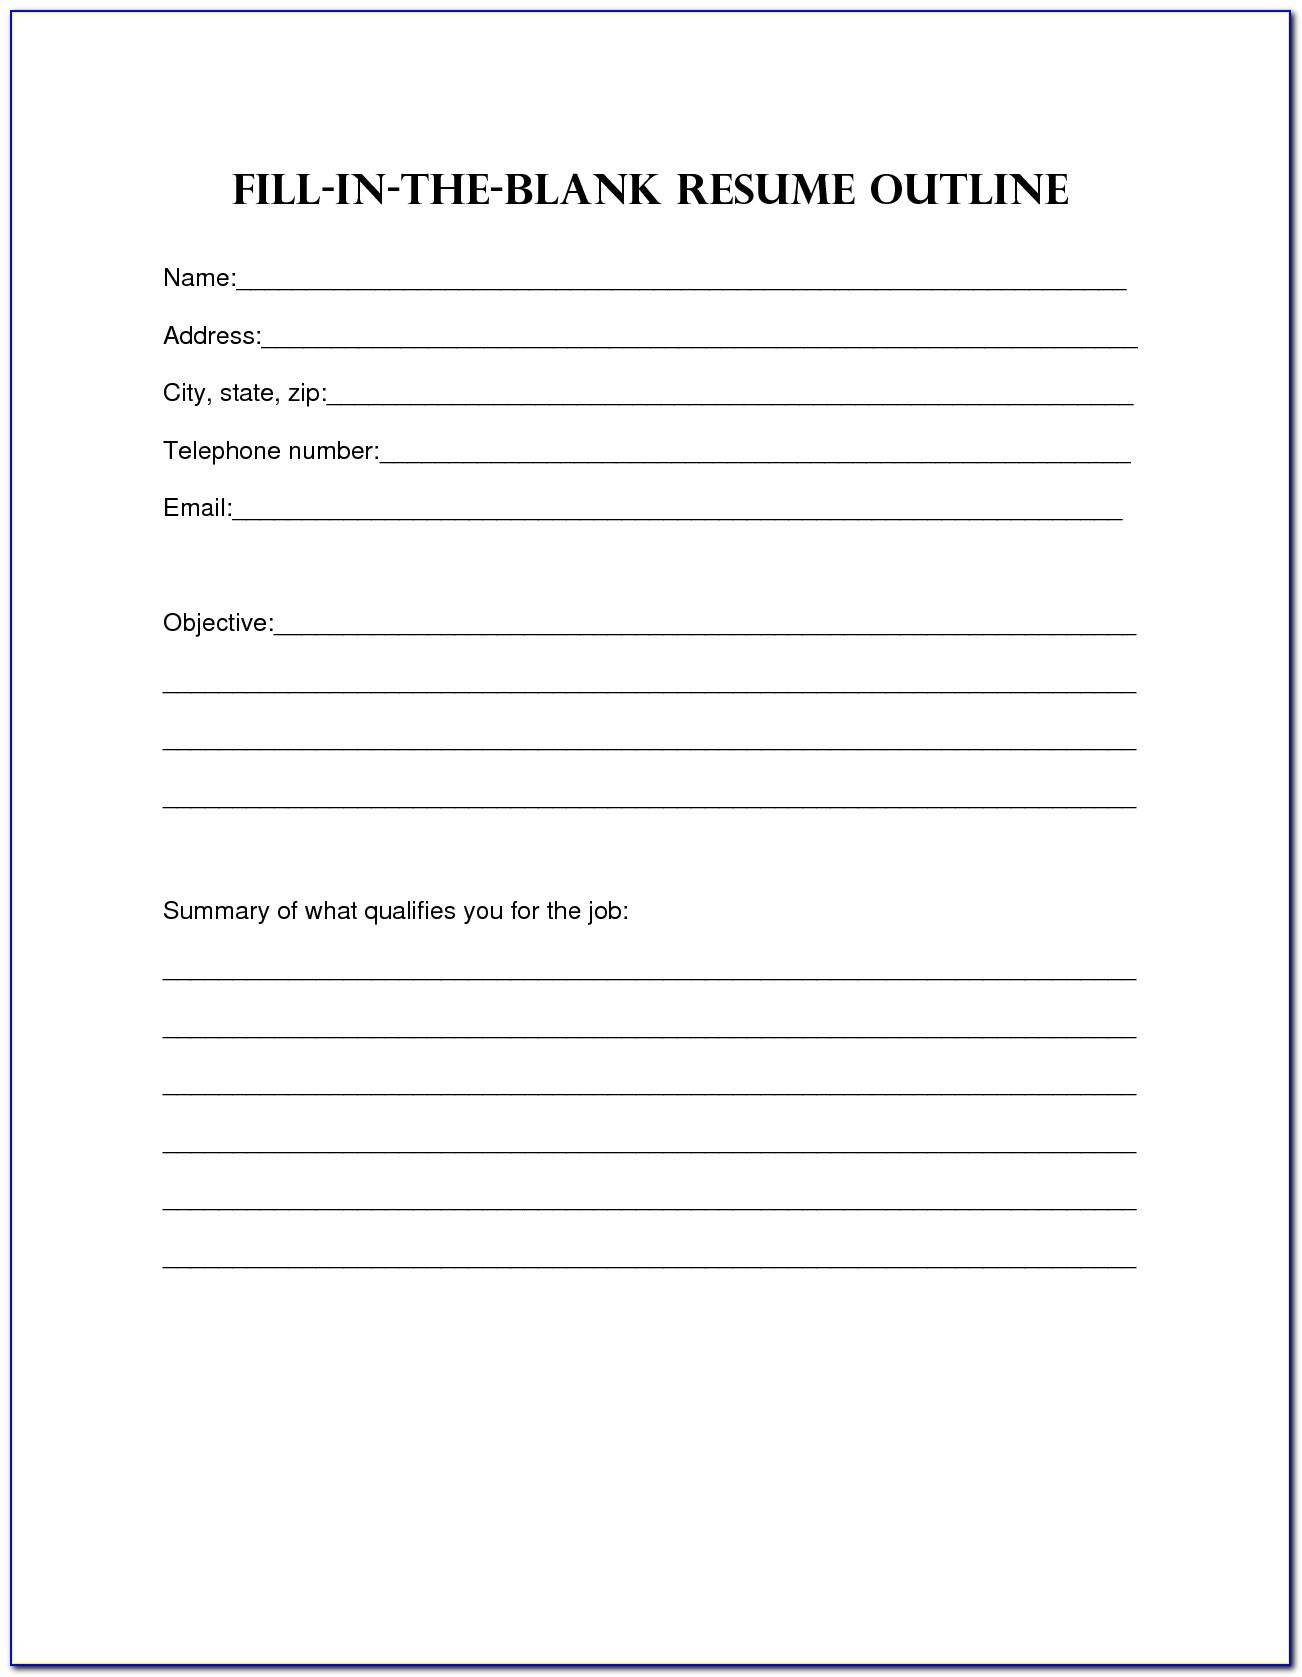 Fill Blank Resume Template Microsoft Word